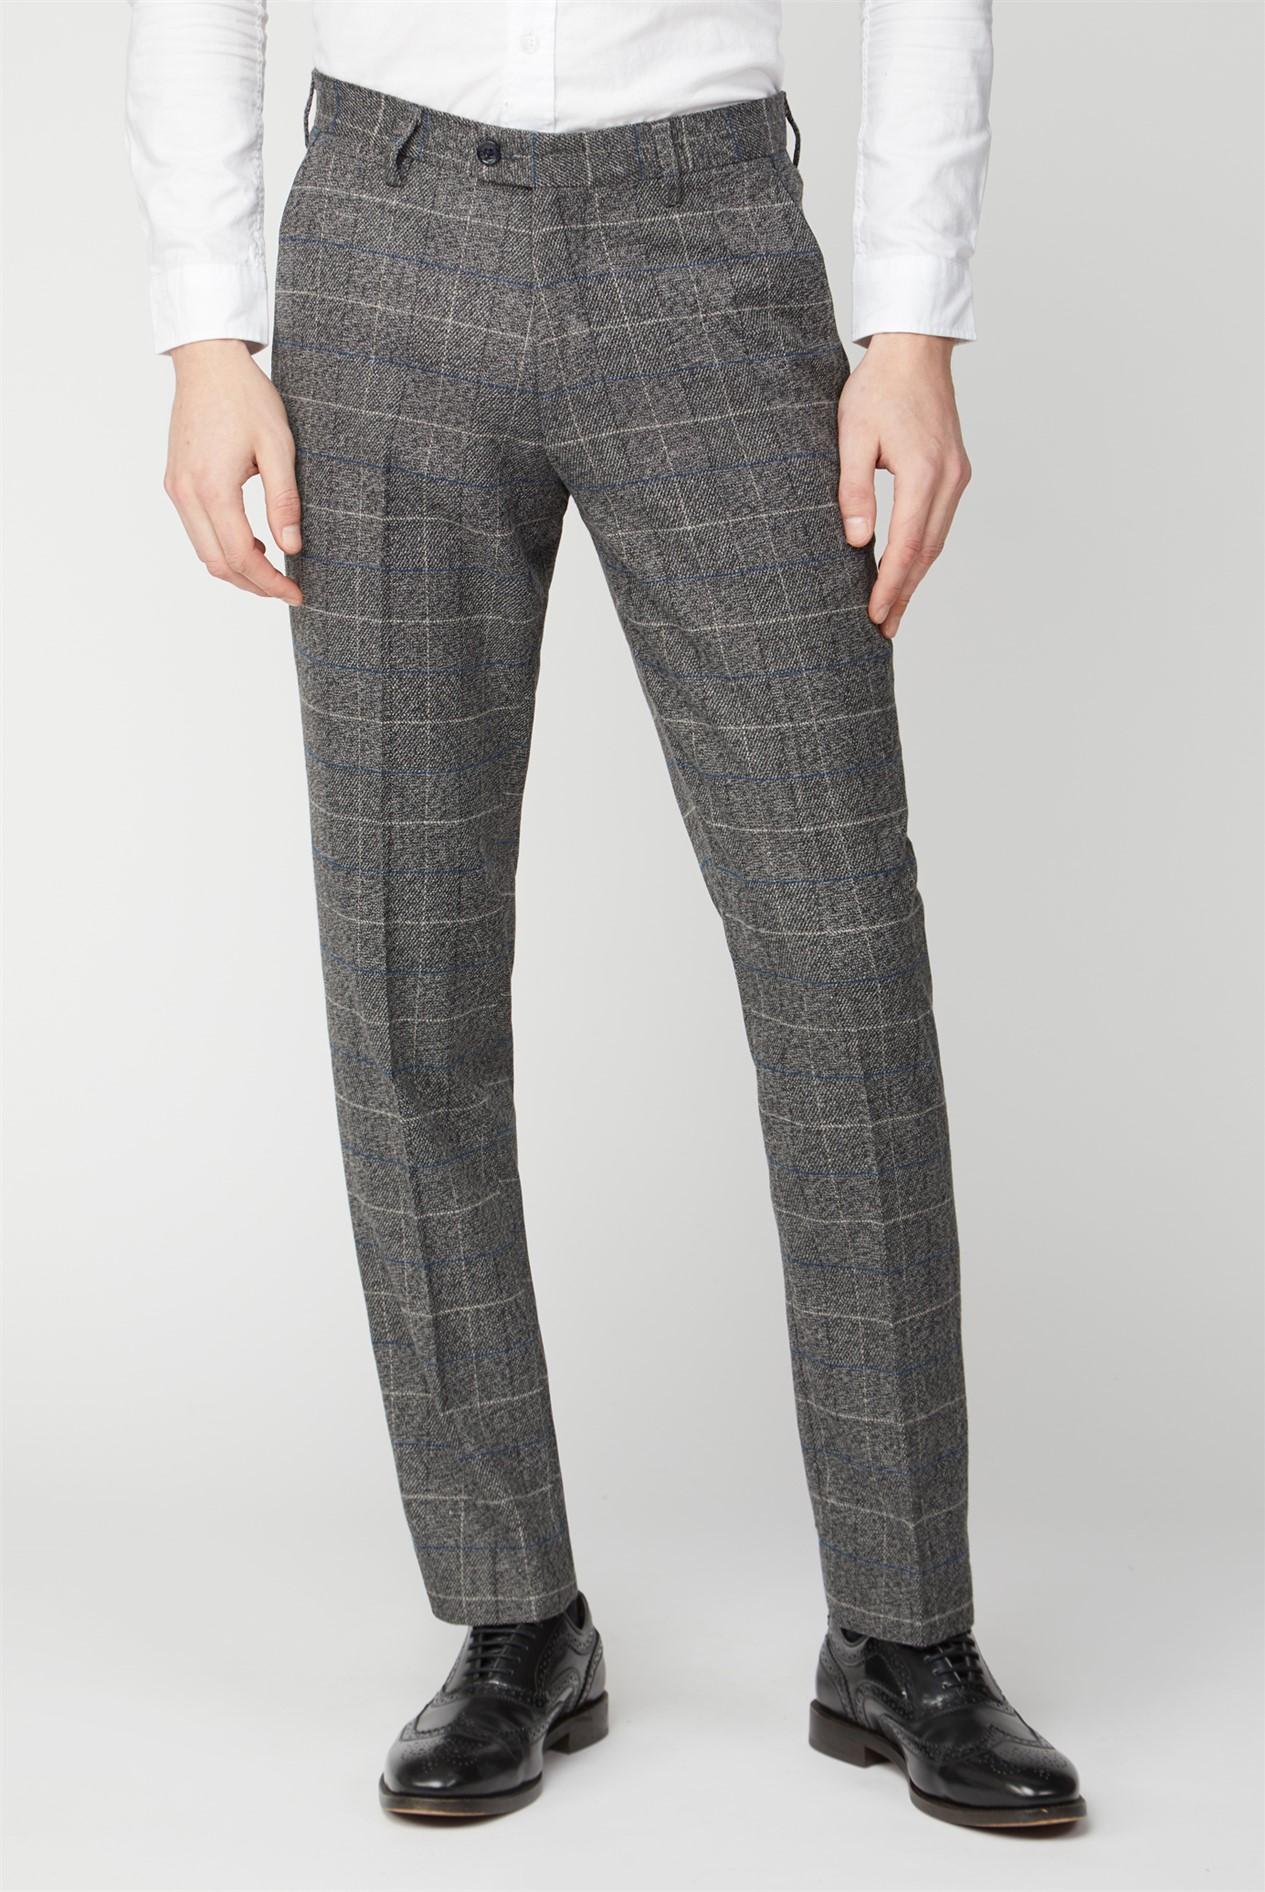 Mens Marc Darcy Tweed Grey Trousers Work Wedding Smart Casual Formal Pants